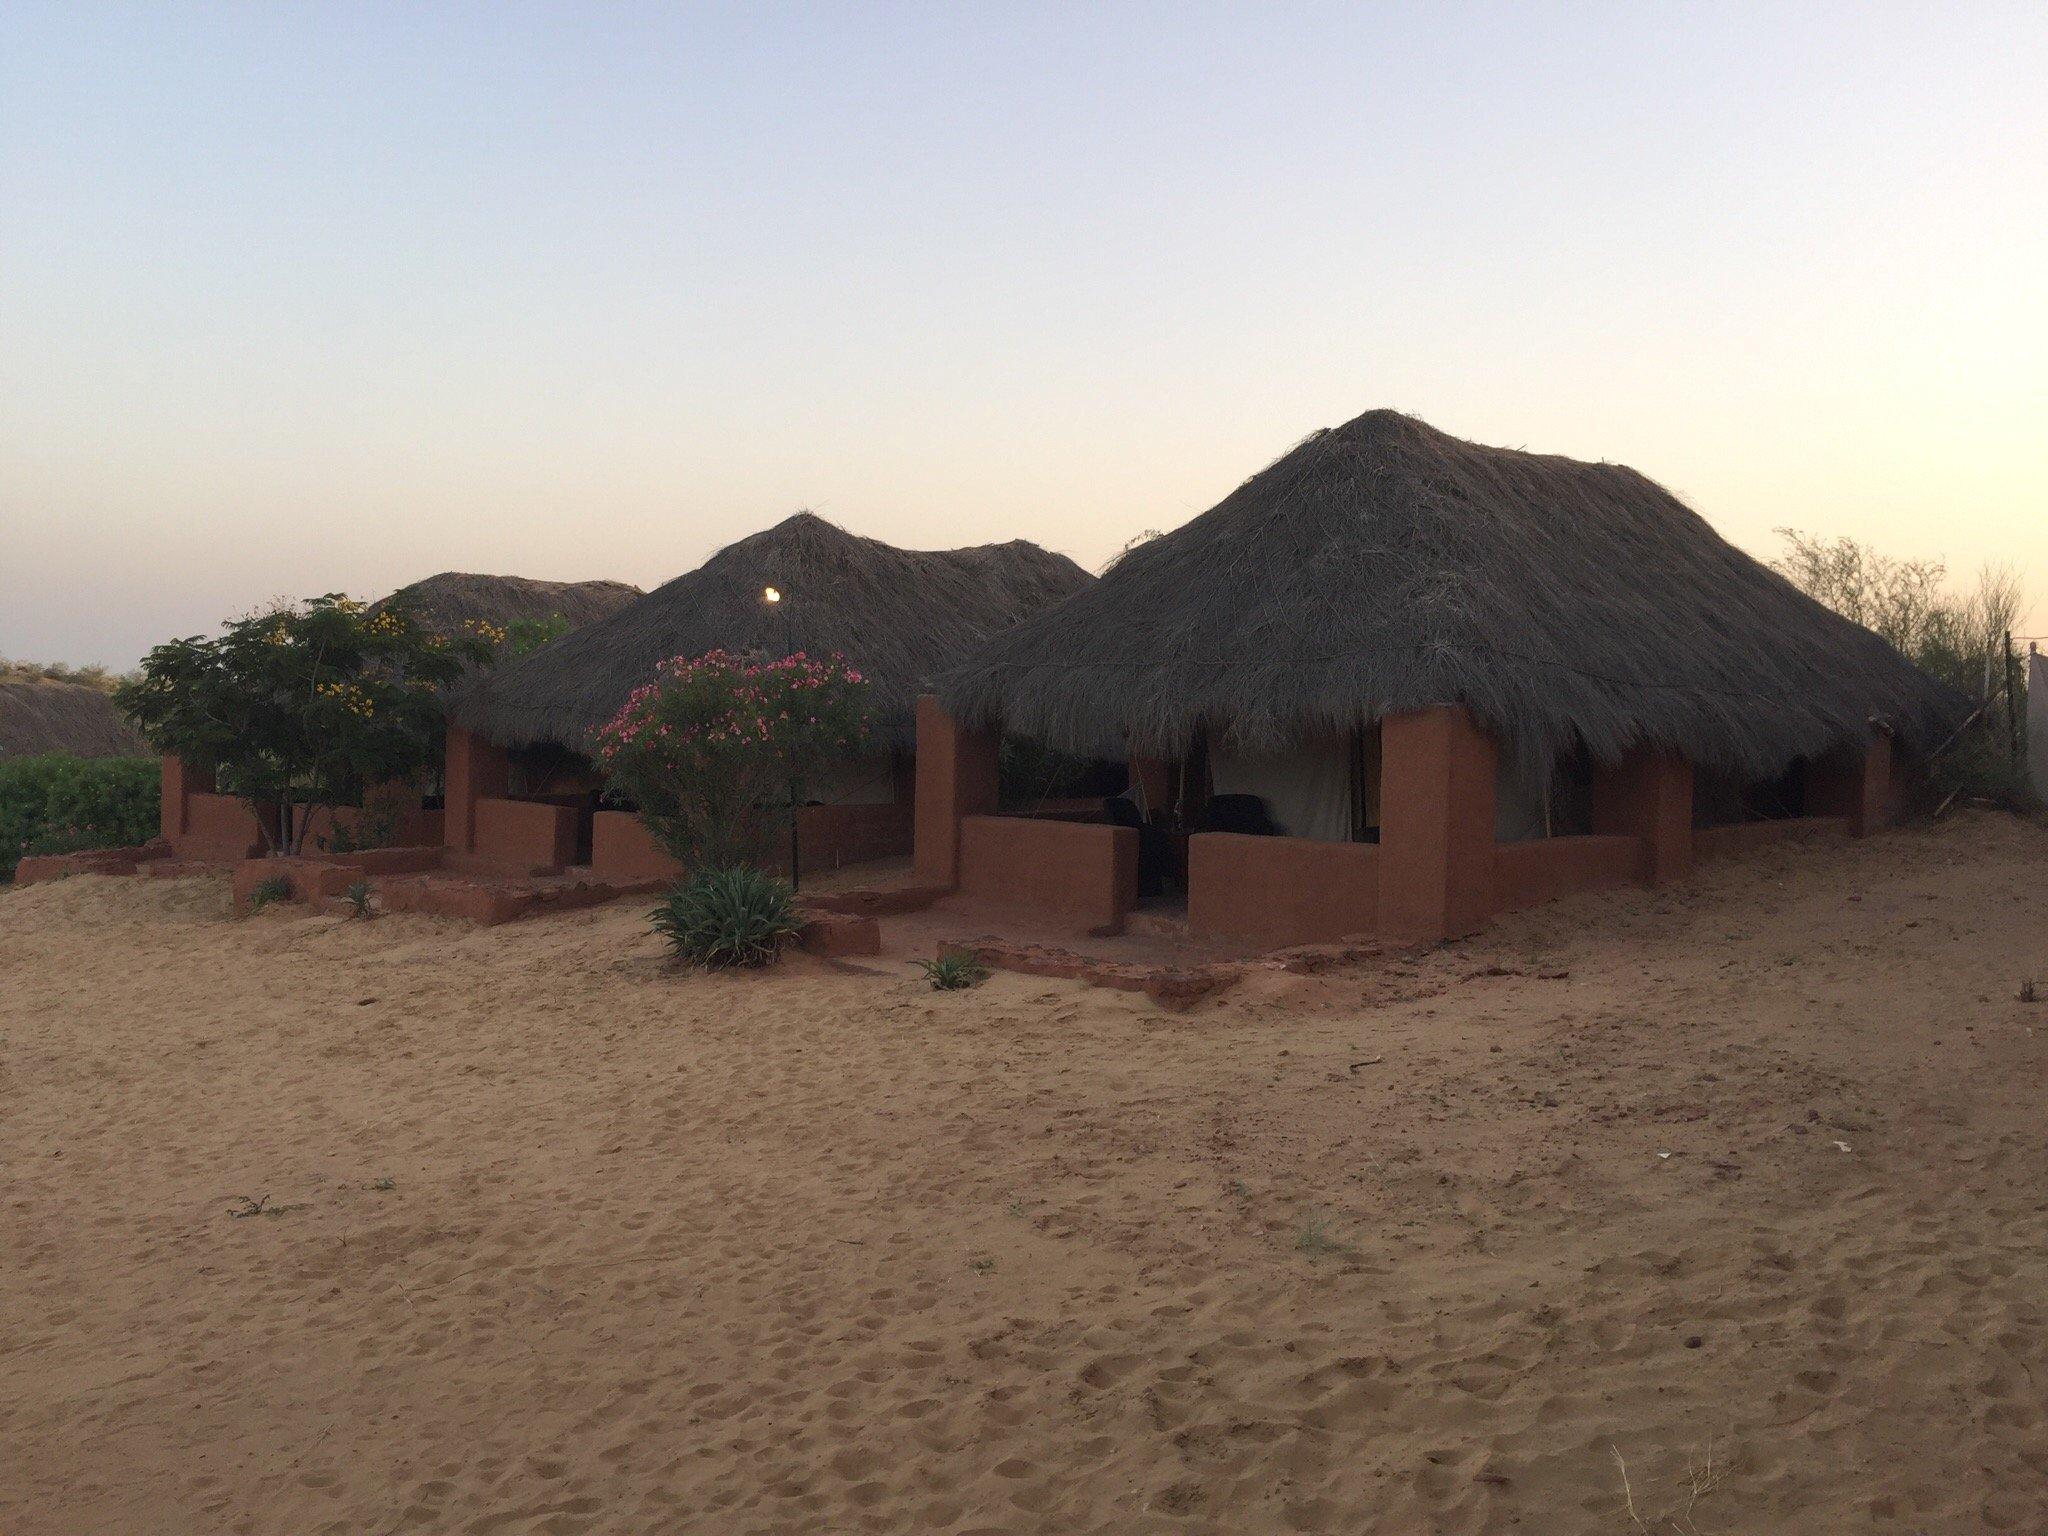 Reggie's Camel Camp